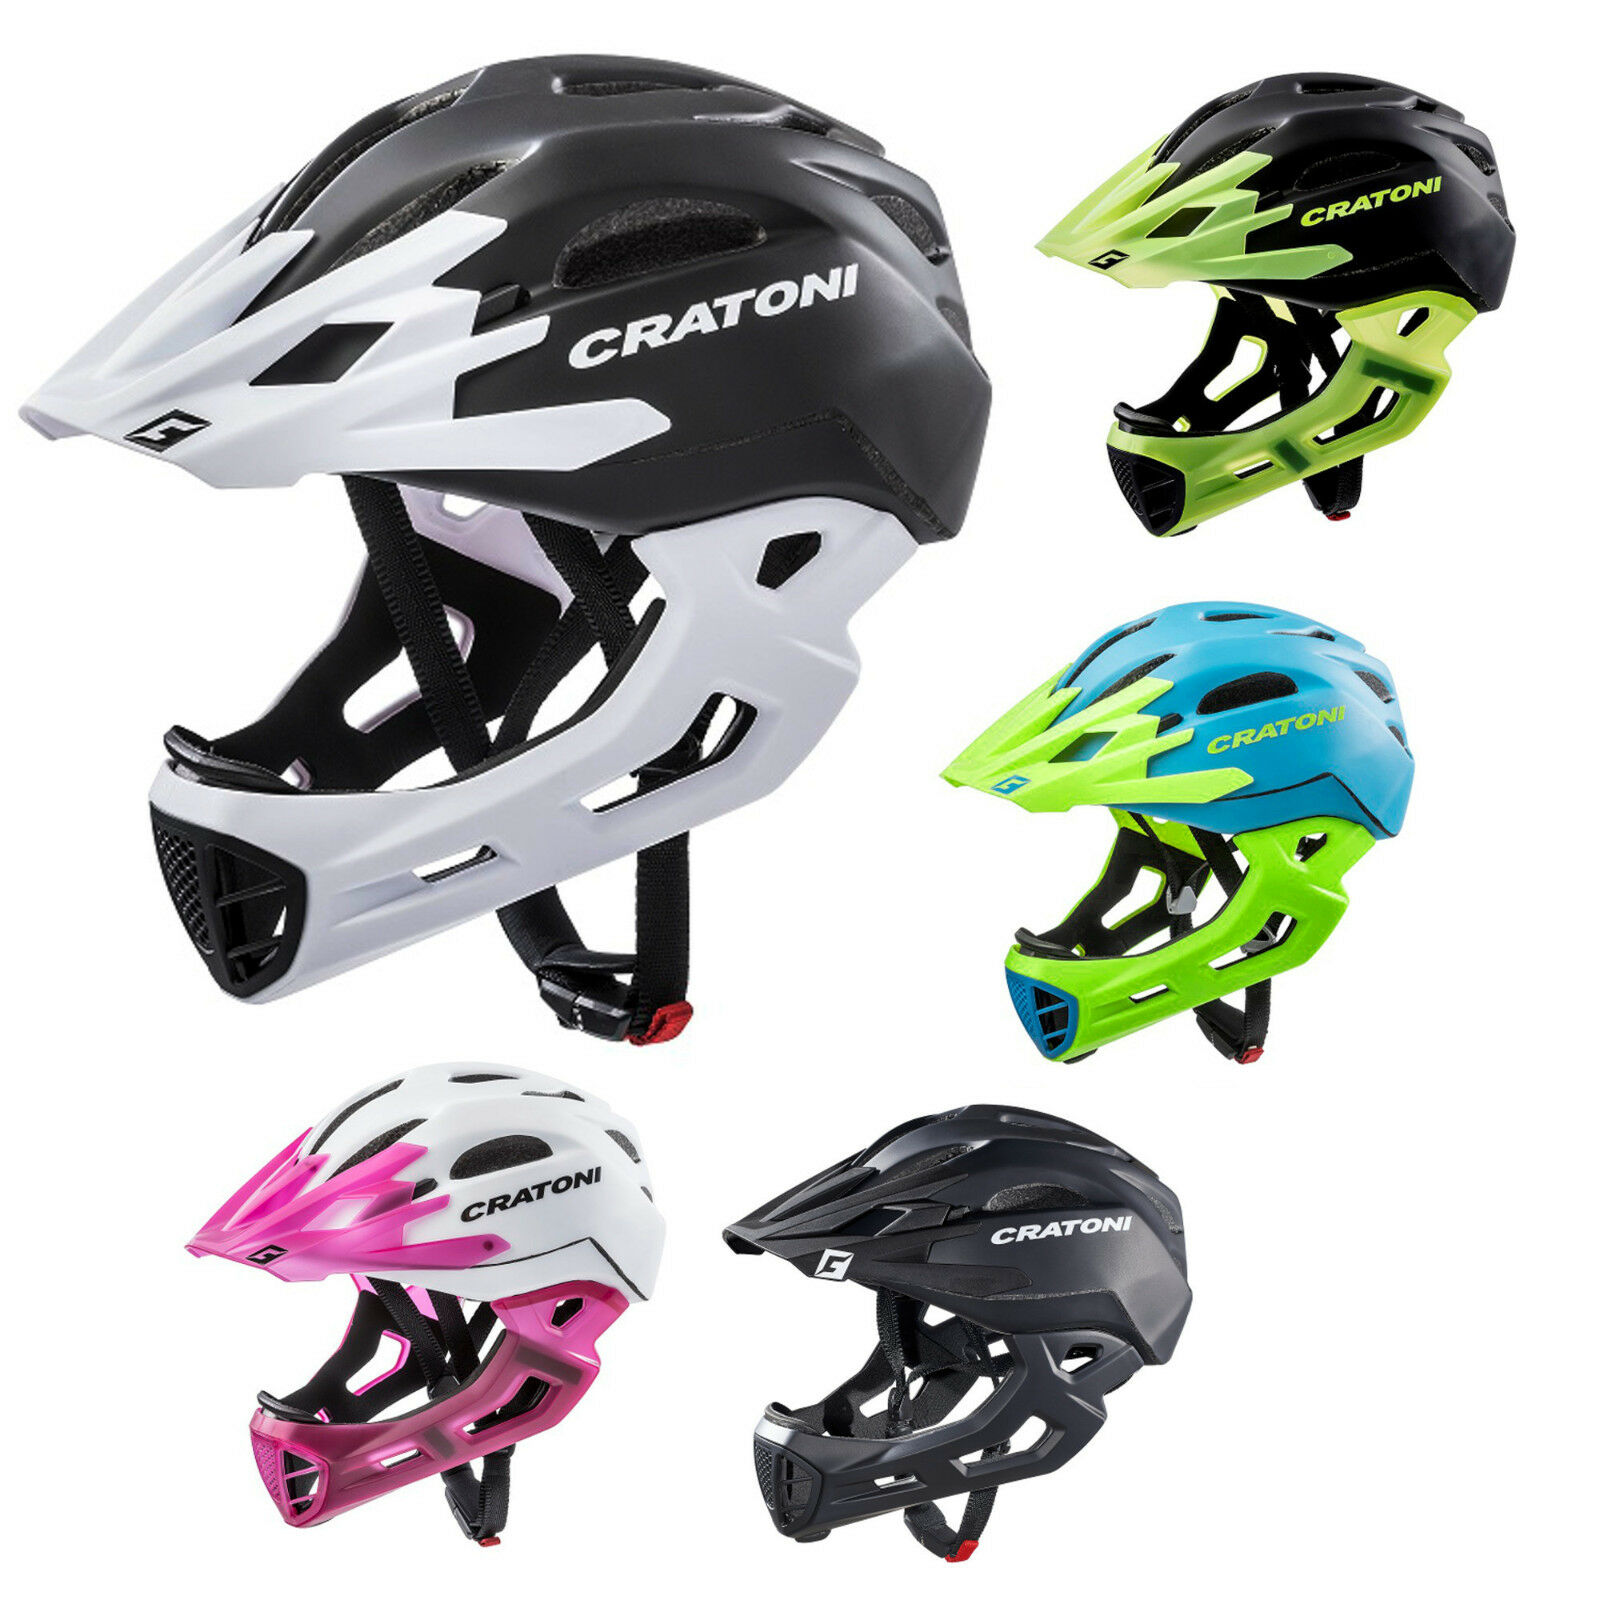 Cratoni C-Maniac modelo 2019 downhillhelm freeride kinnbügel cascos de bicicleta BMX